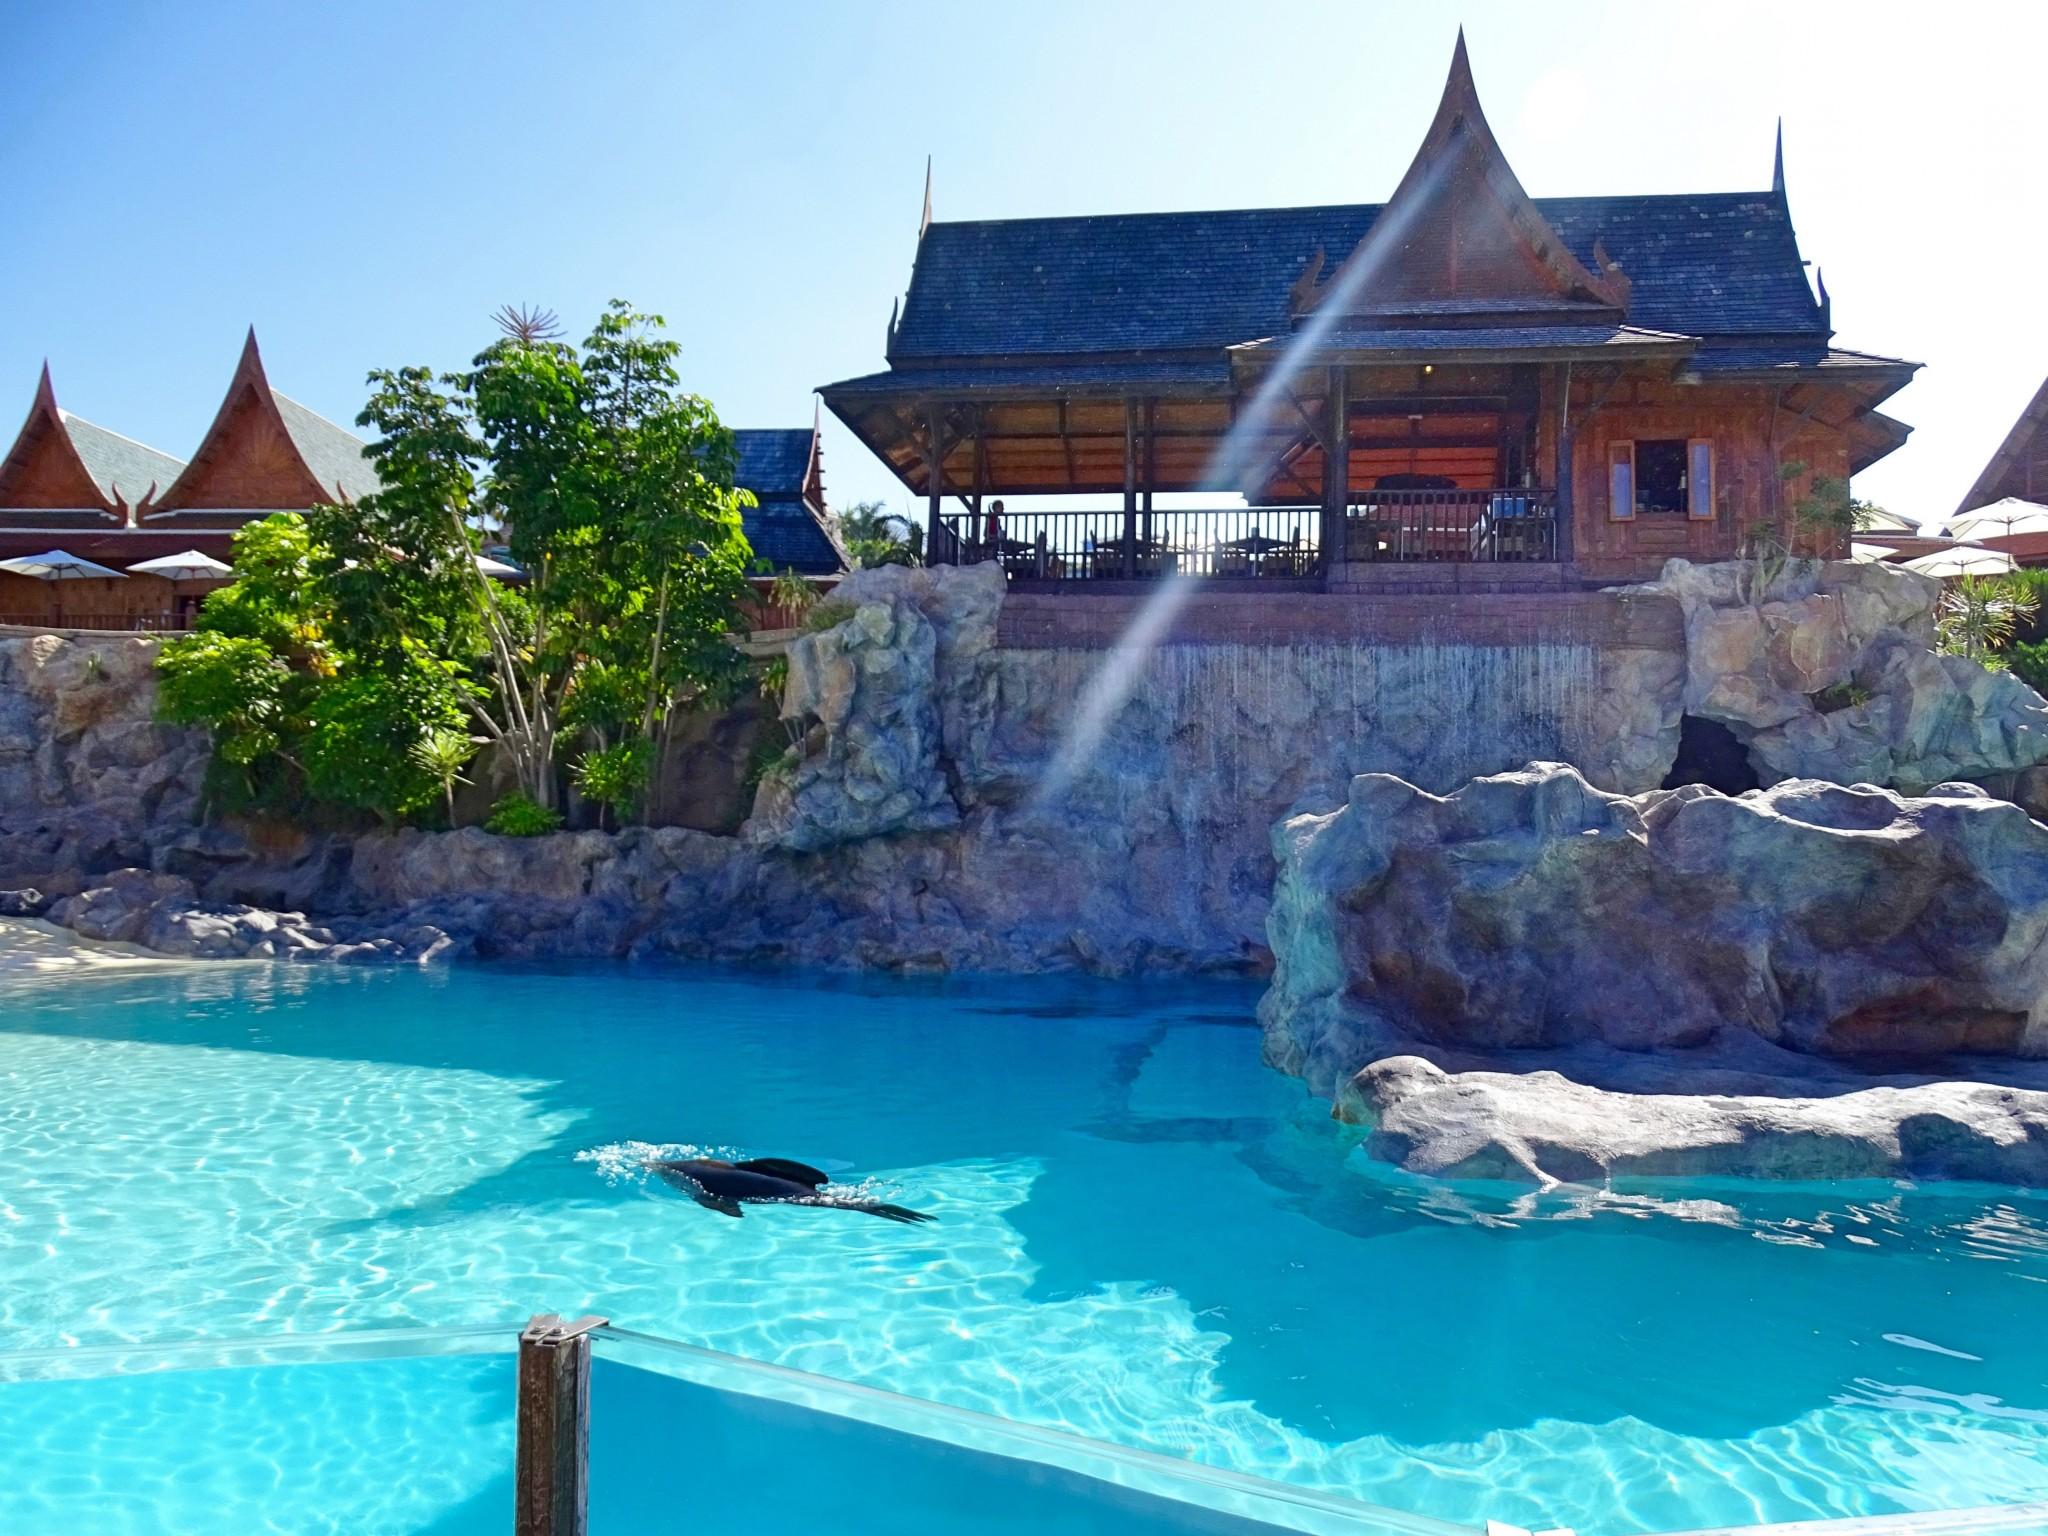 Siam Park Sea Lion Island